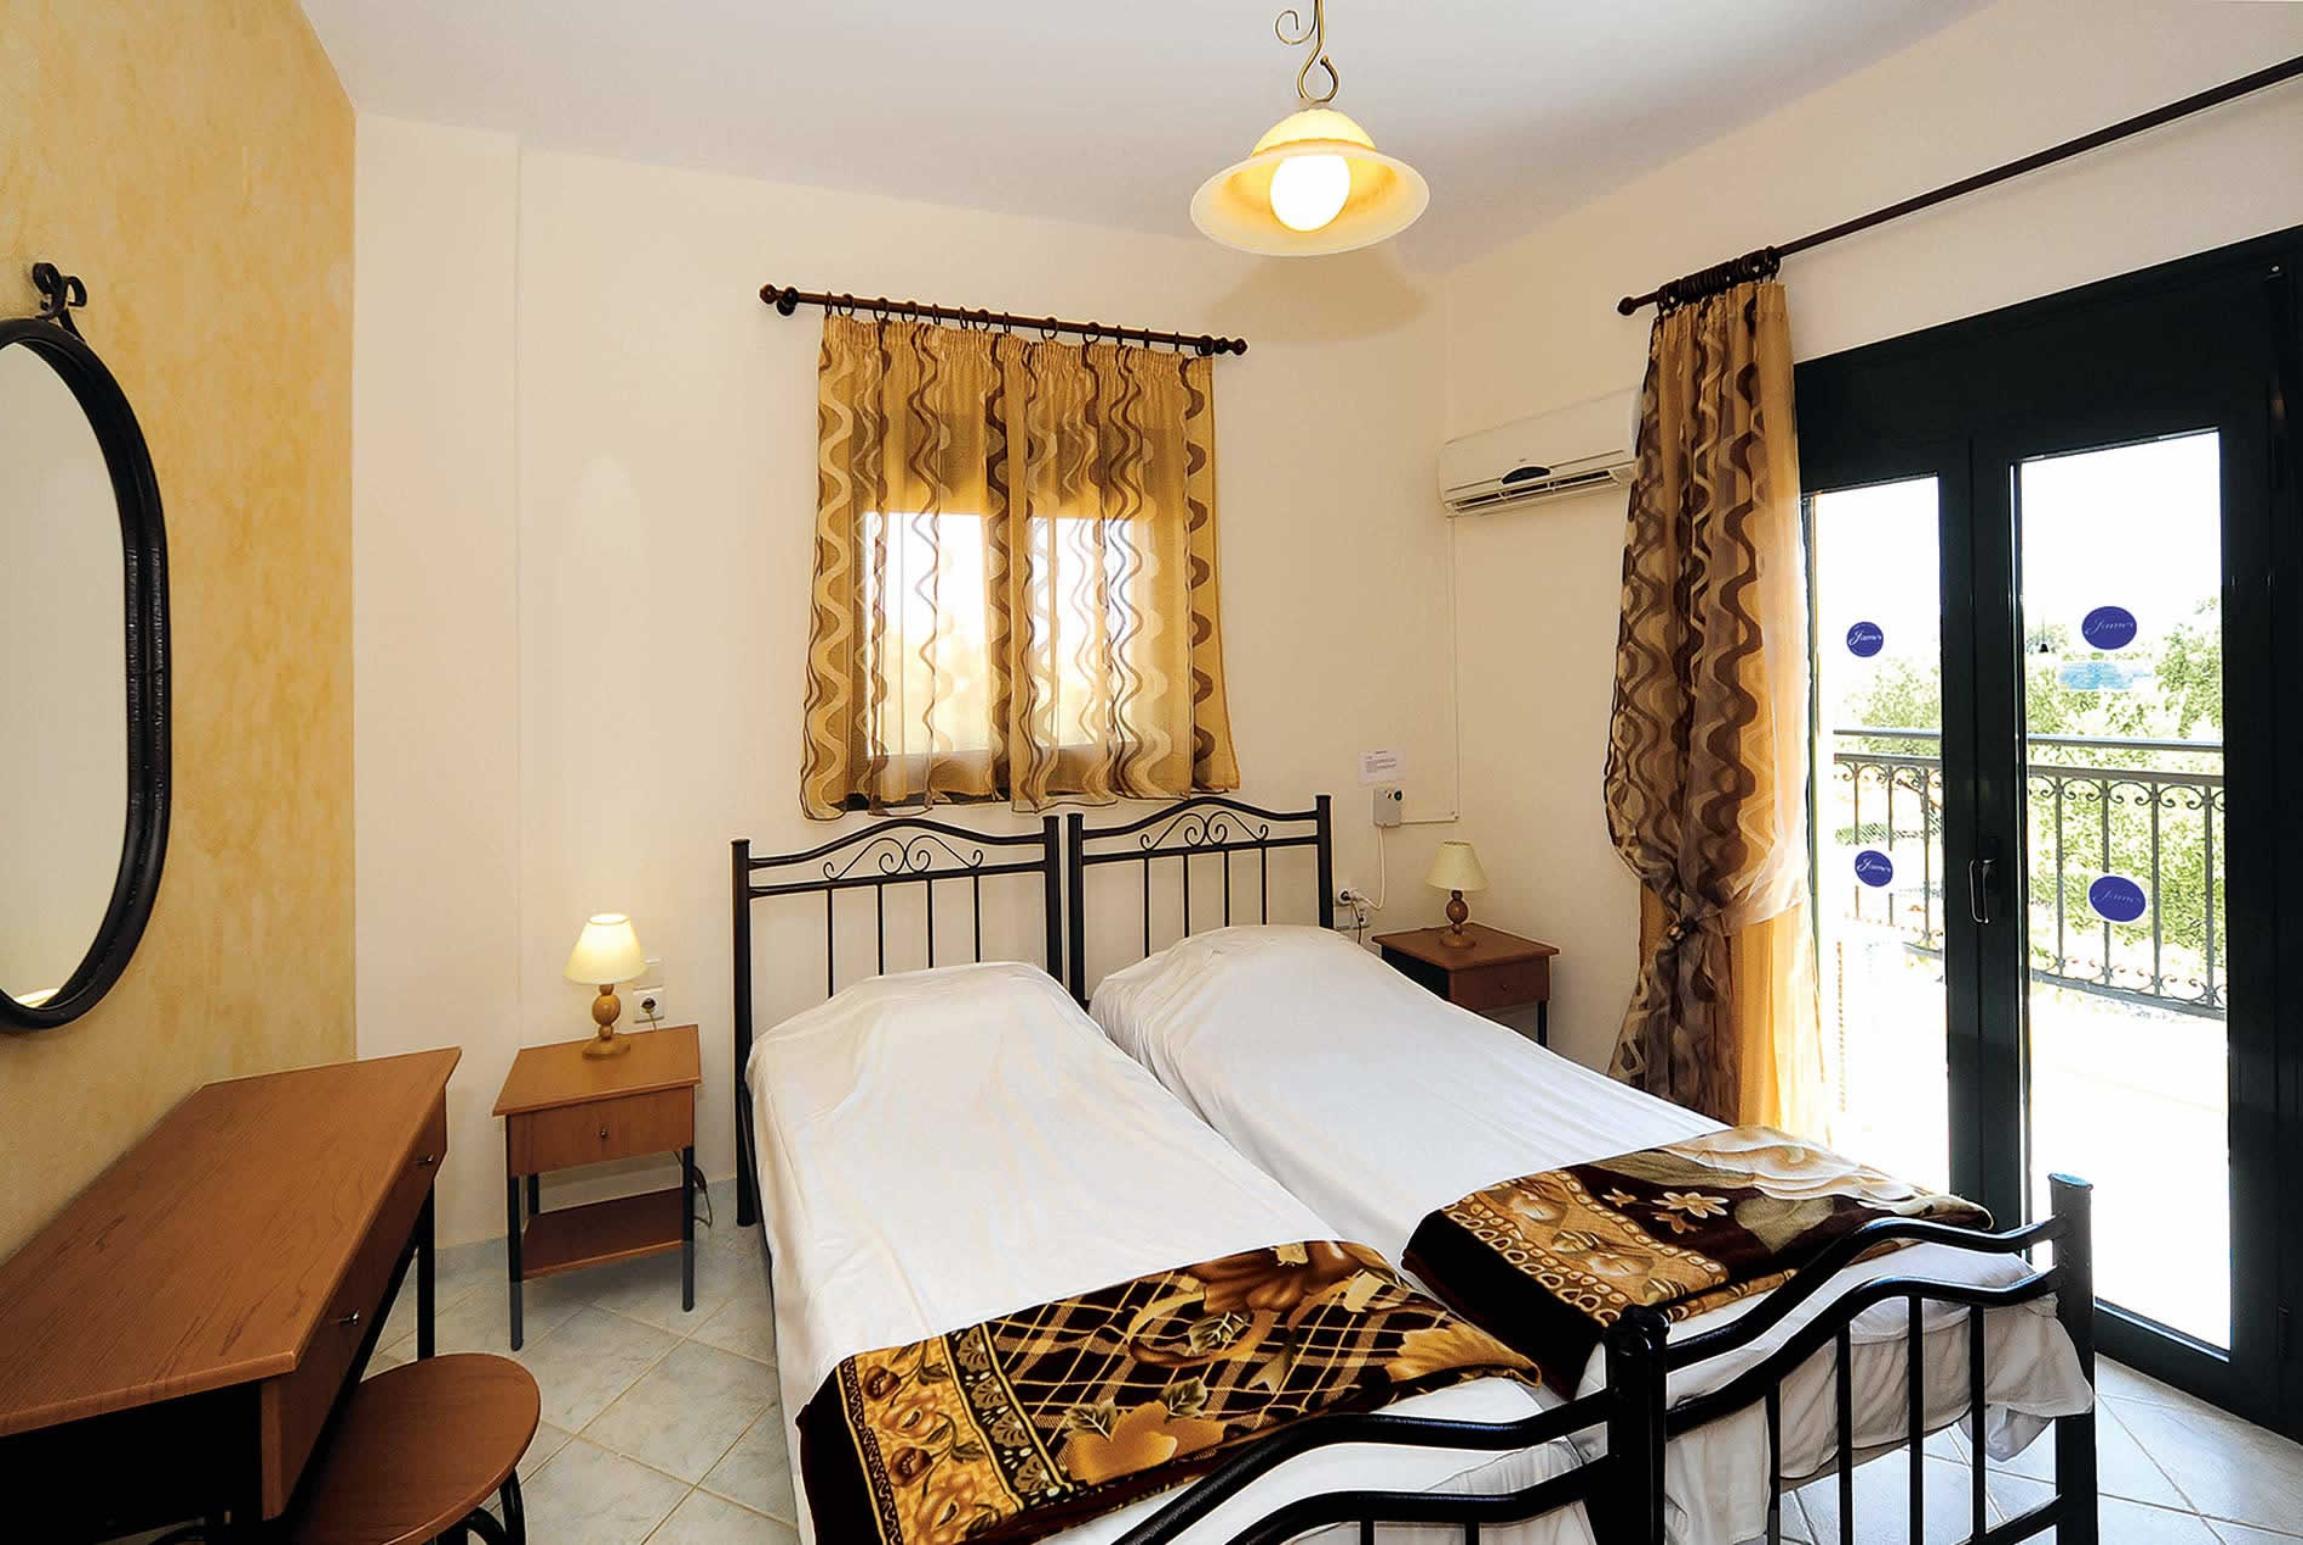 Ferienhaus Dina (2653758), Roumeli, Kreta Nordküste, Kreta, Griechenland, Bild 7